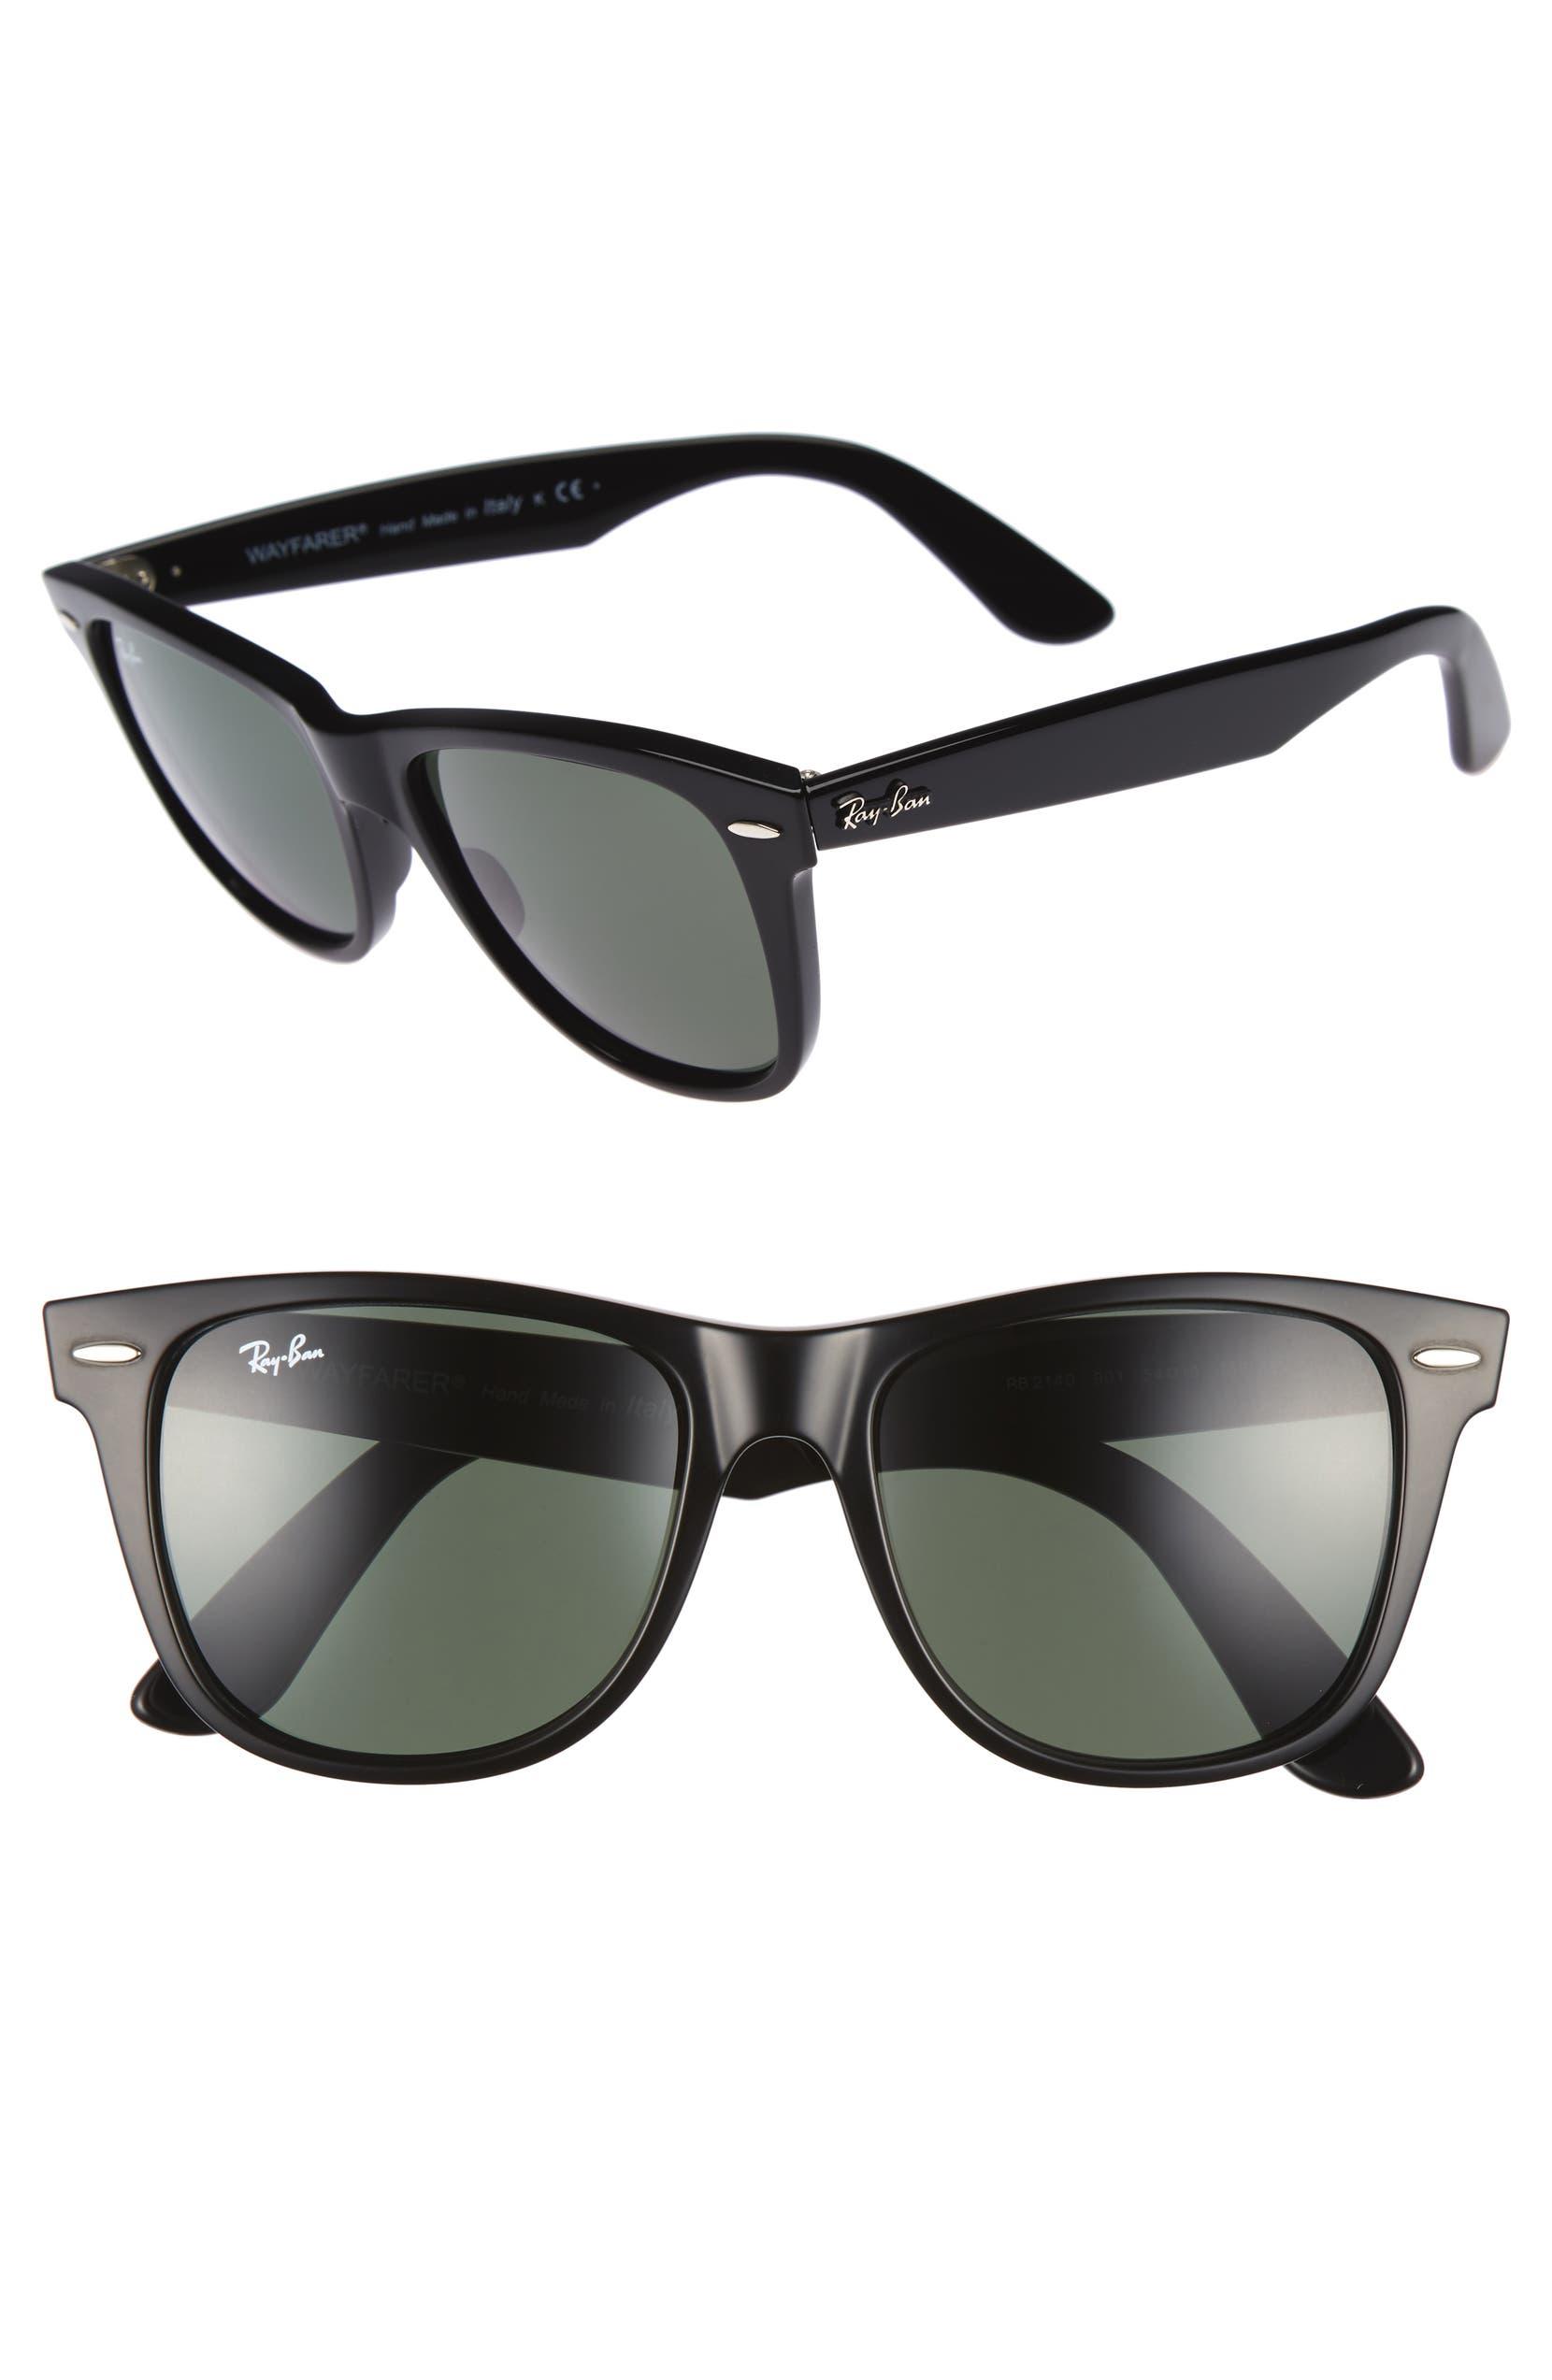 Ray-Ban Classic Wayfarer 54mm Sunglasses  63a4c6775df90